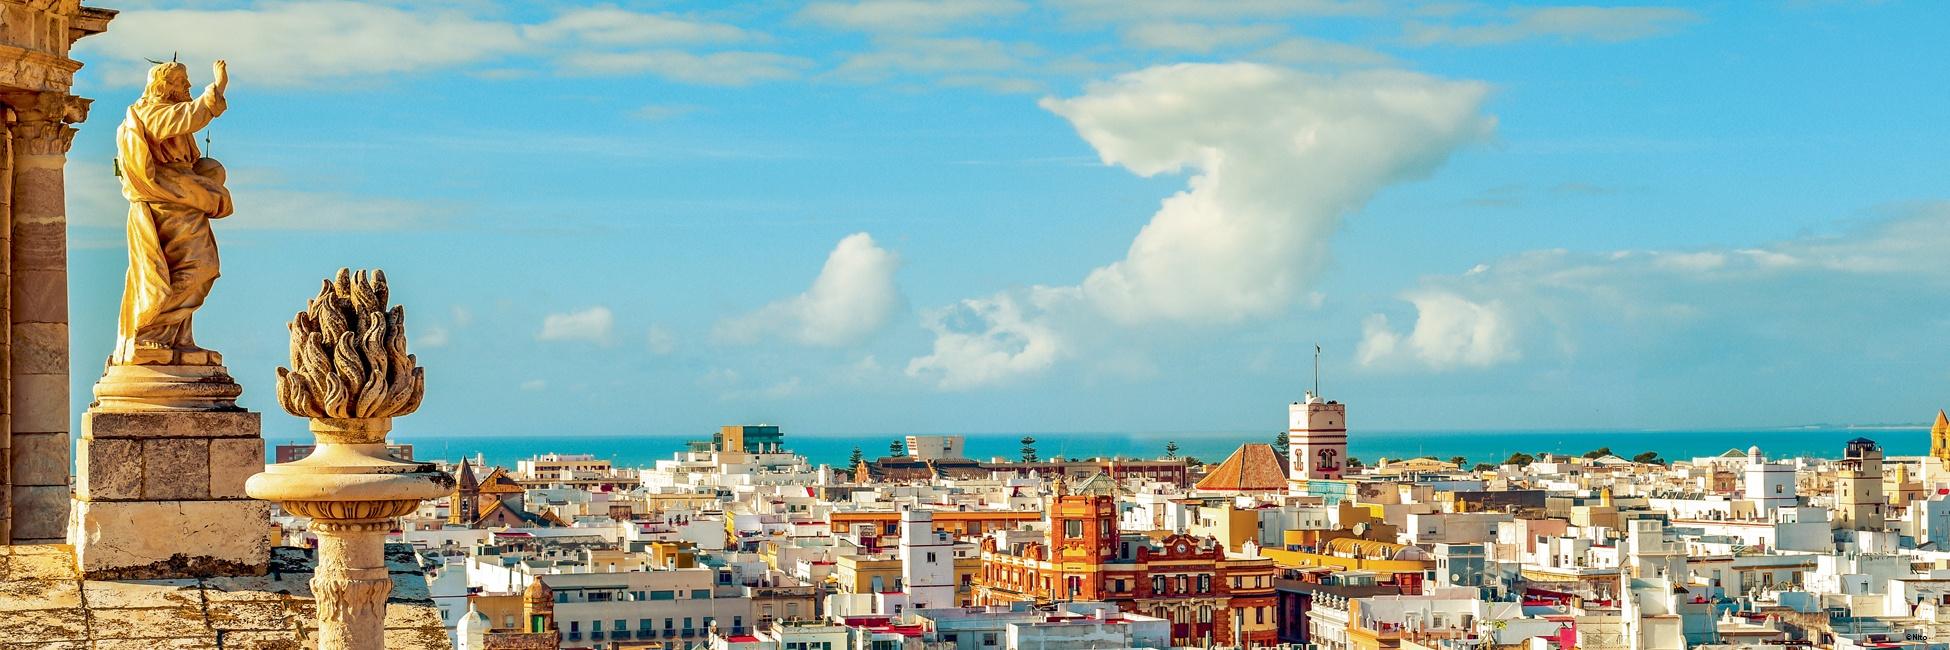 Cadix, Espagne